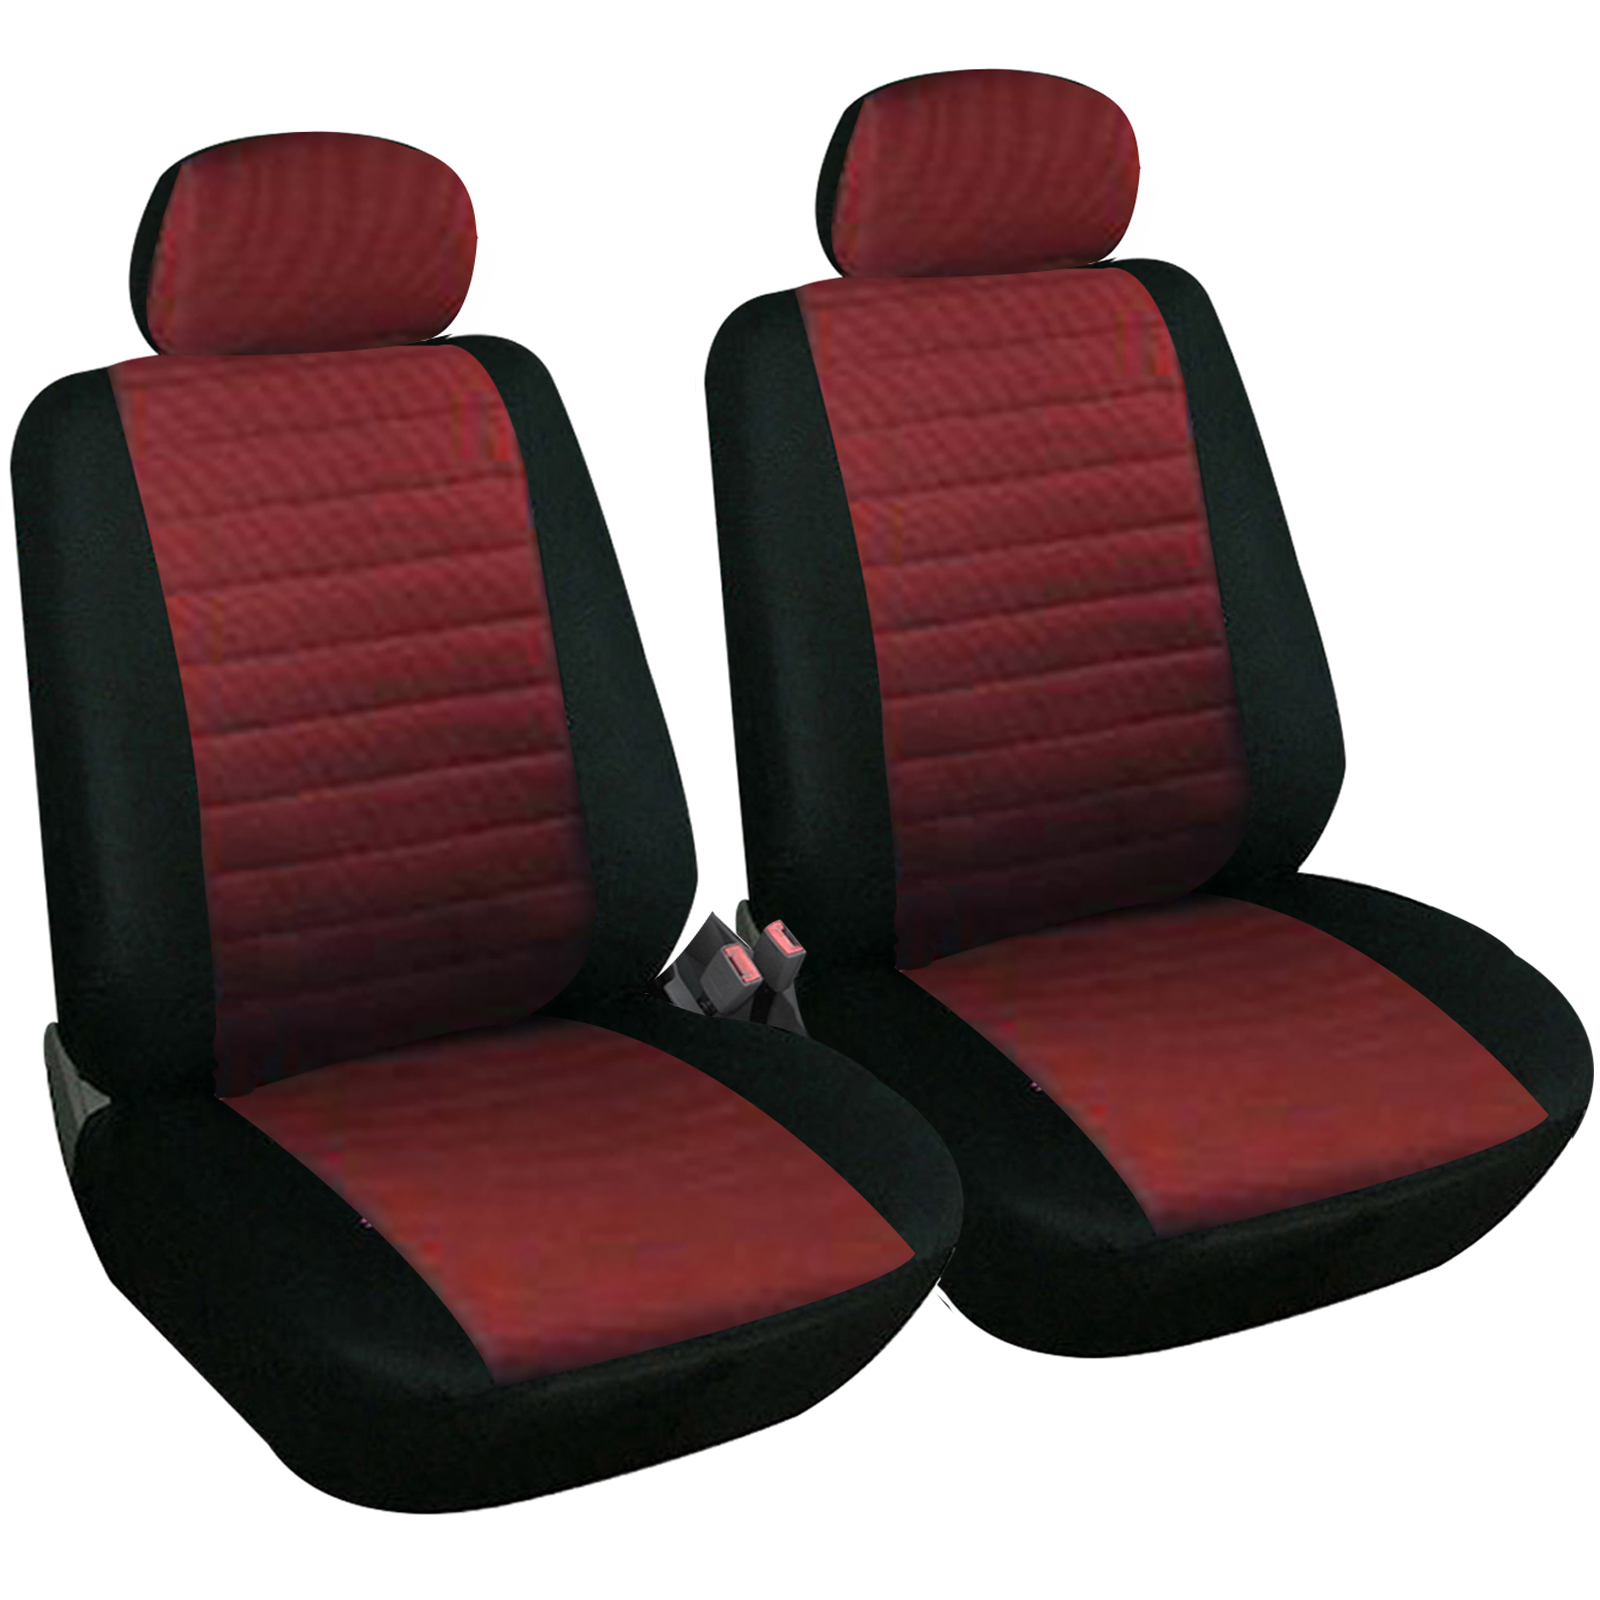 van sitzbez ge schonbez ge 2x einzel sitze vw sharan touran schwarz rot 7233 ebay. Black Bedroom Furniture Sets. Home Design Ideas